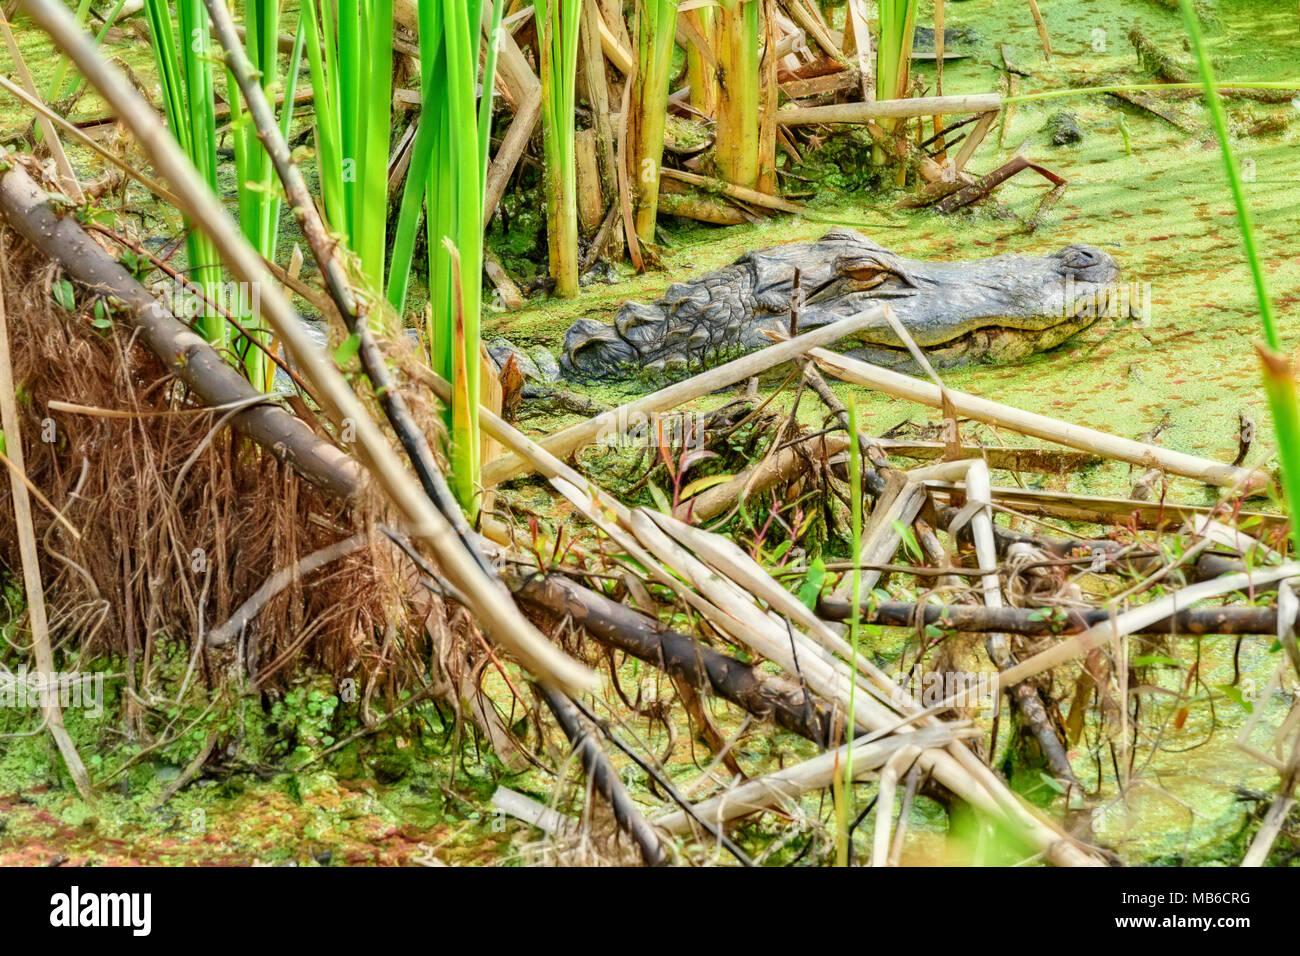 small alligator at gator lake in st. andrews state park, panama city florida - Stock Image